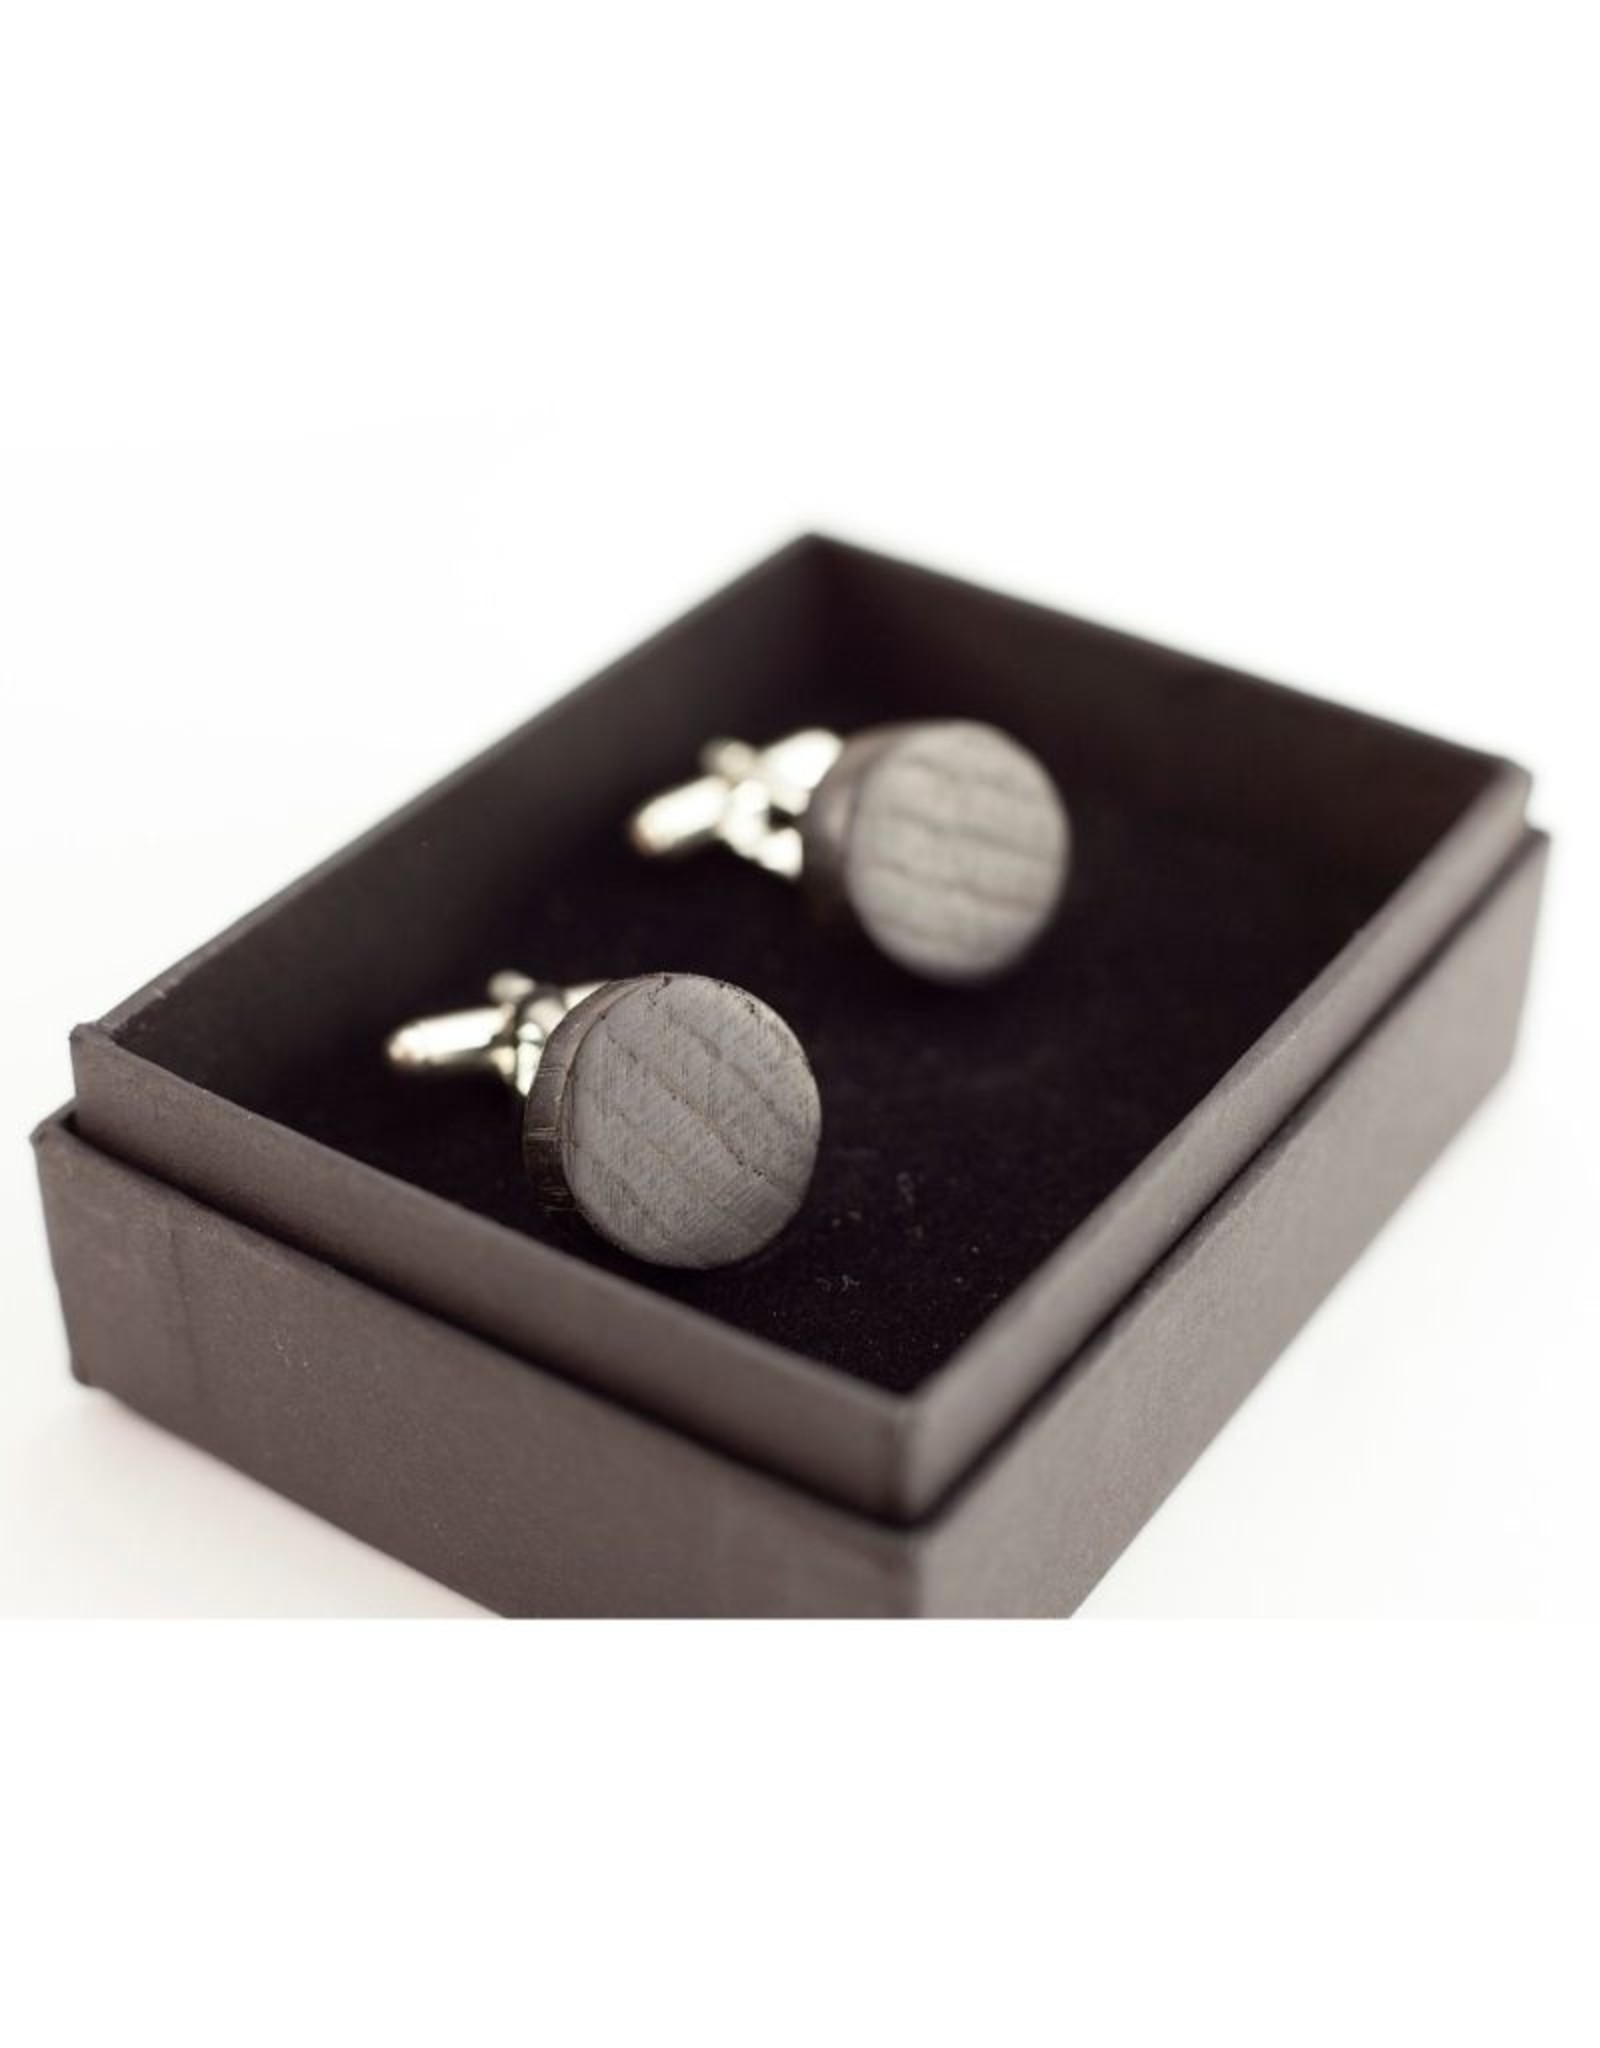 Leko & Leko Jewellery Leko & Leko -Round Cufflinks Silver Plated